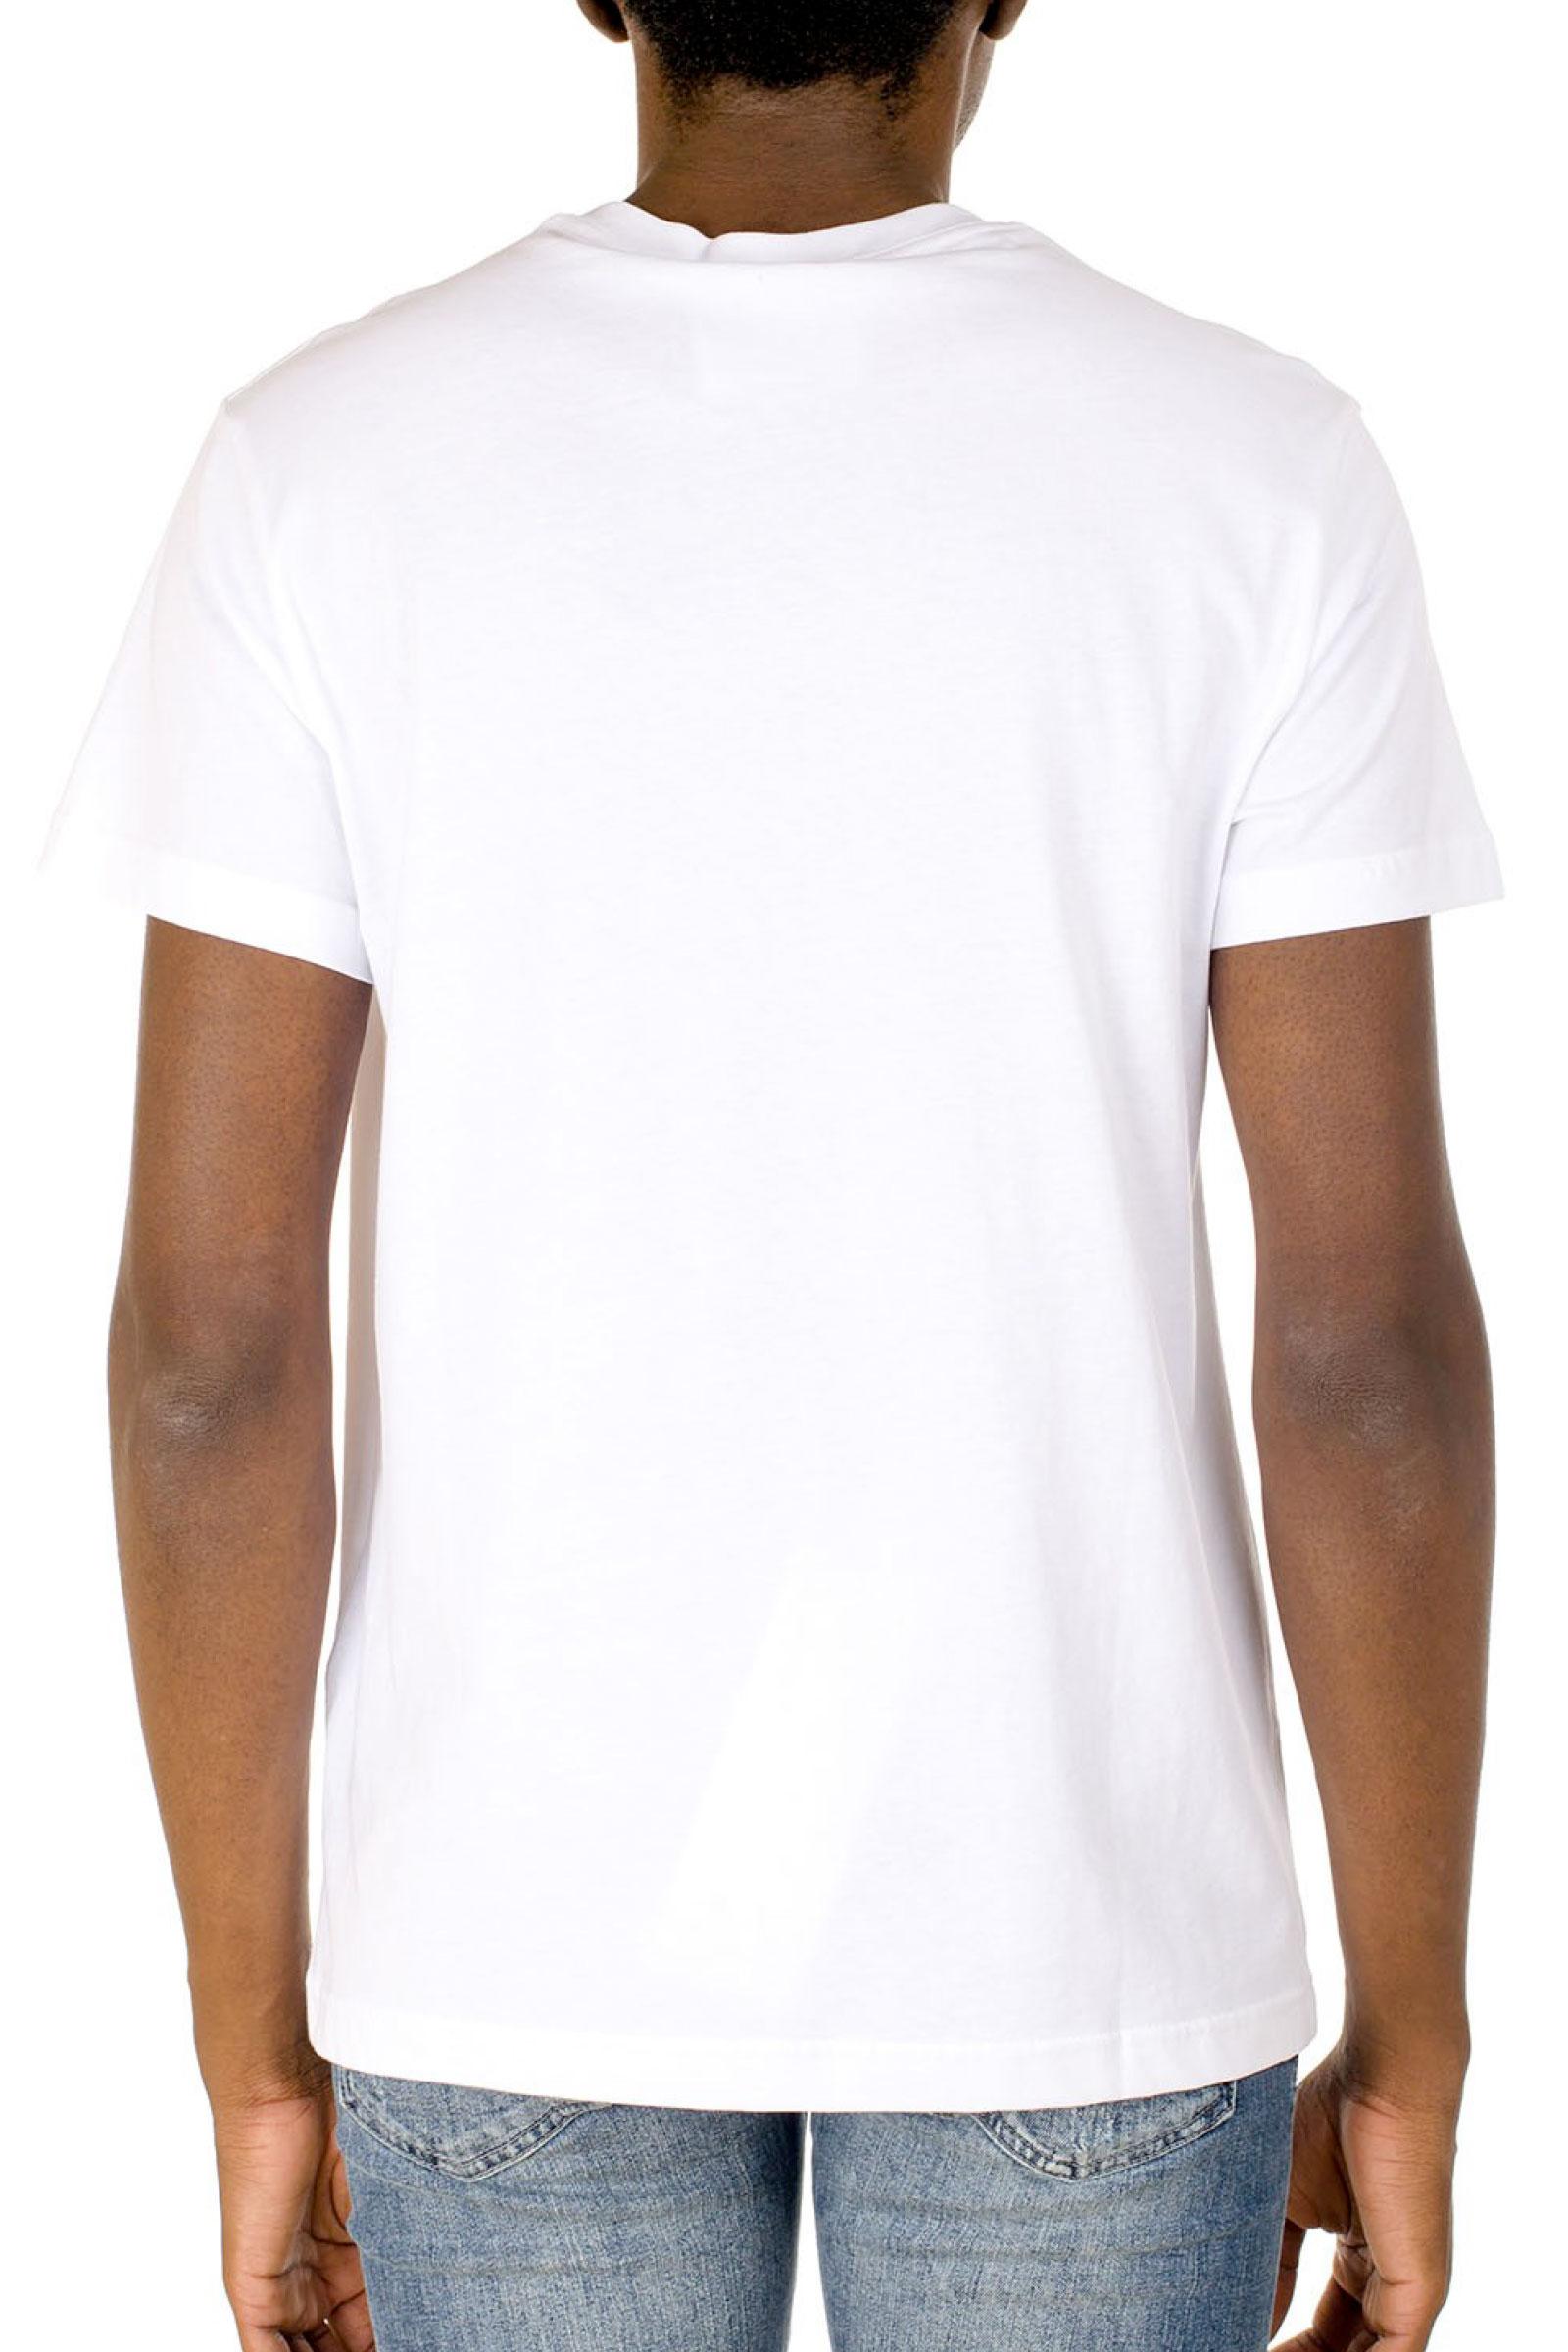 VERSACE JEANS COUTURE | T-Shirt | 71GAHT12 CJ00TG03